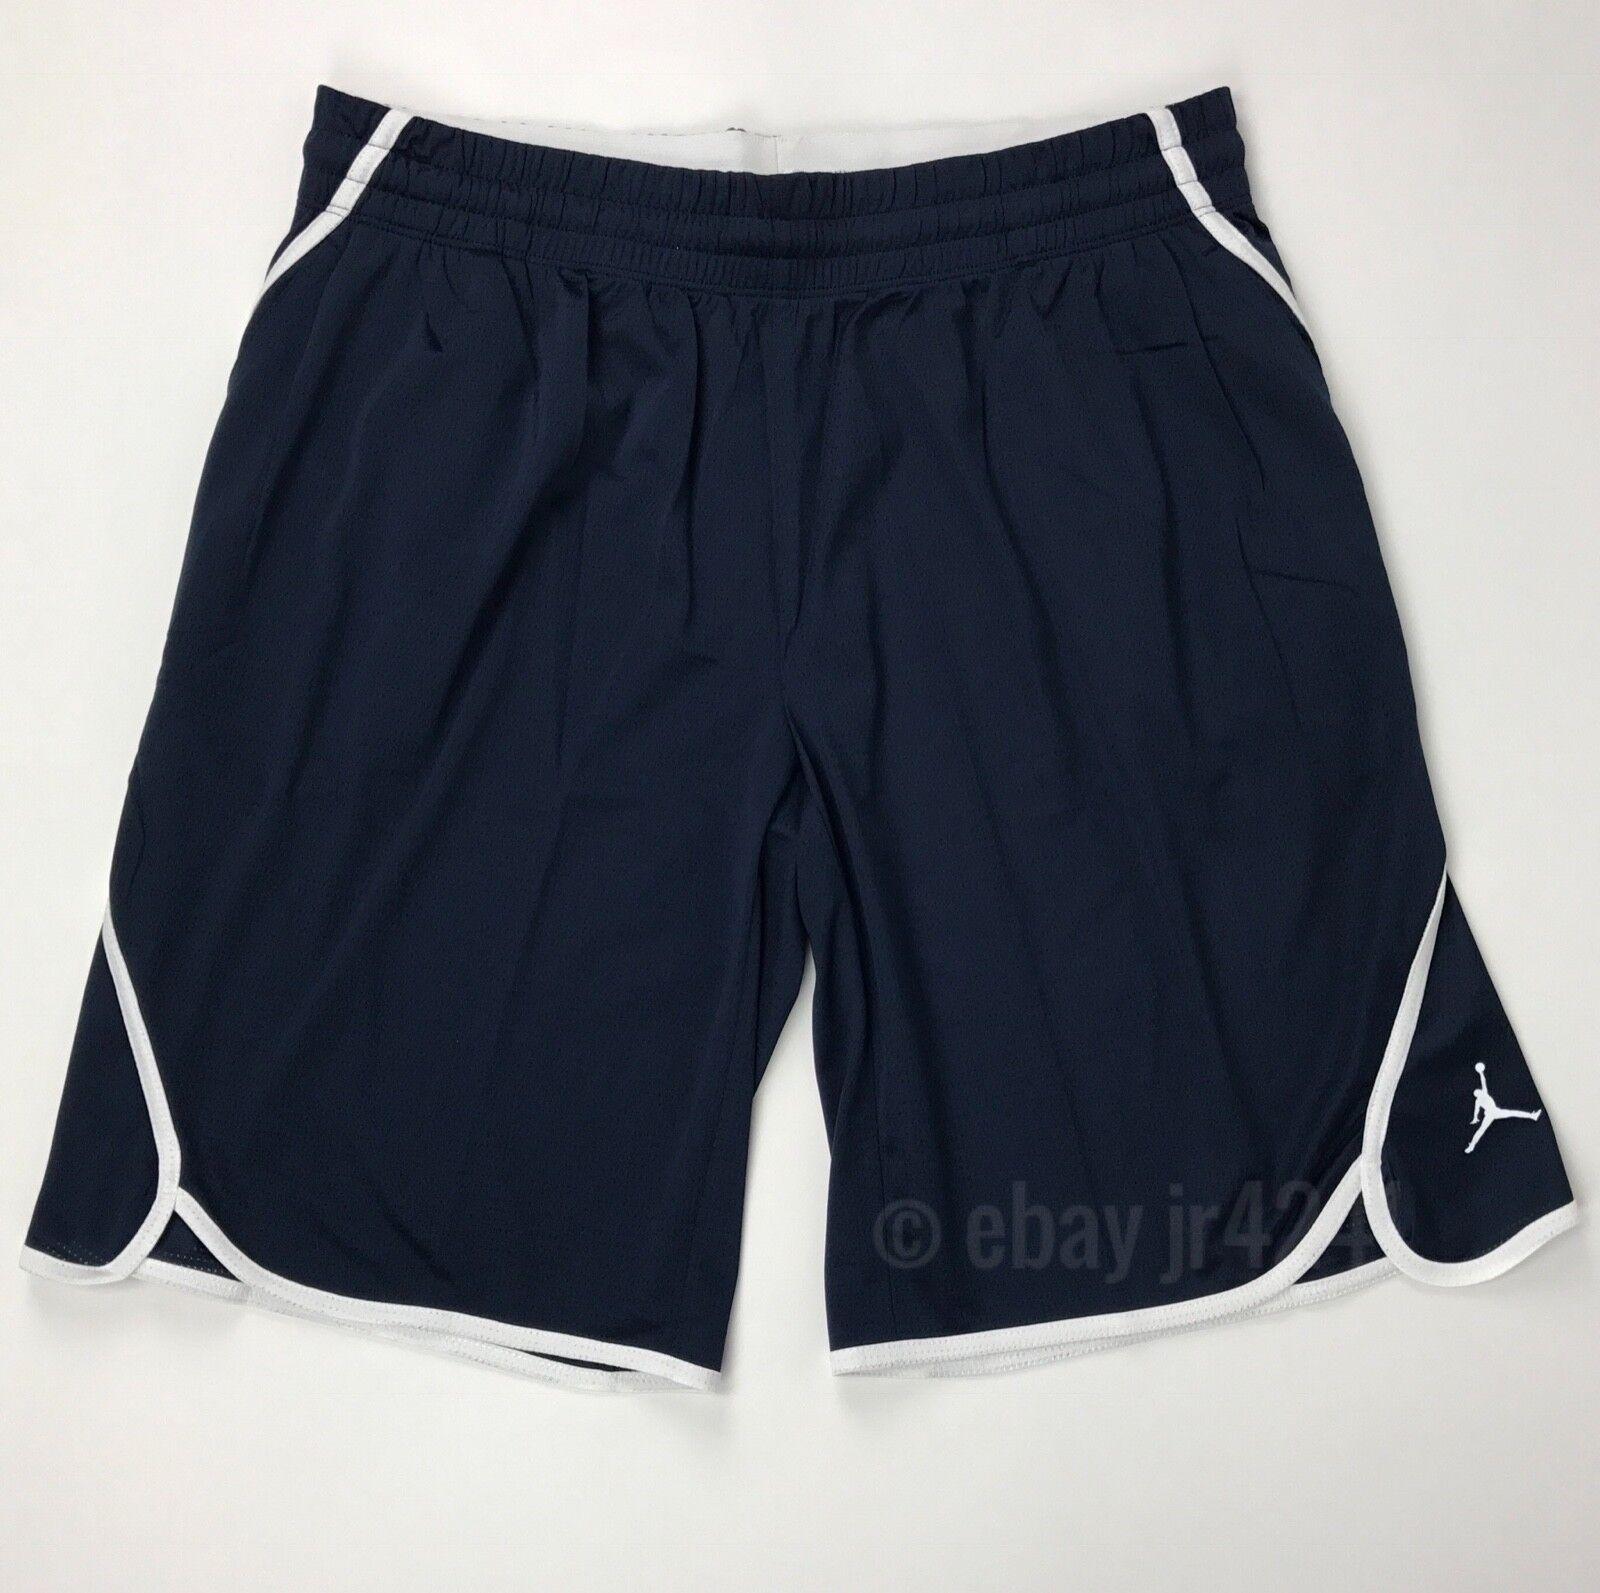 Jordan Men/'s Flight Air Basketball Shorts AR2830 014 size X-Large New with tag